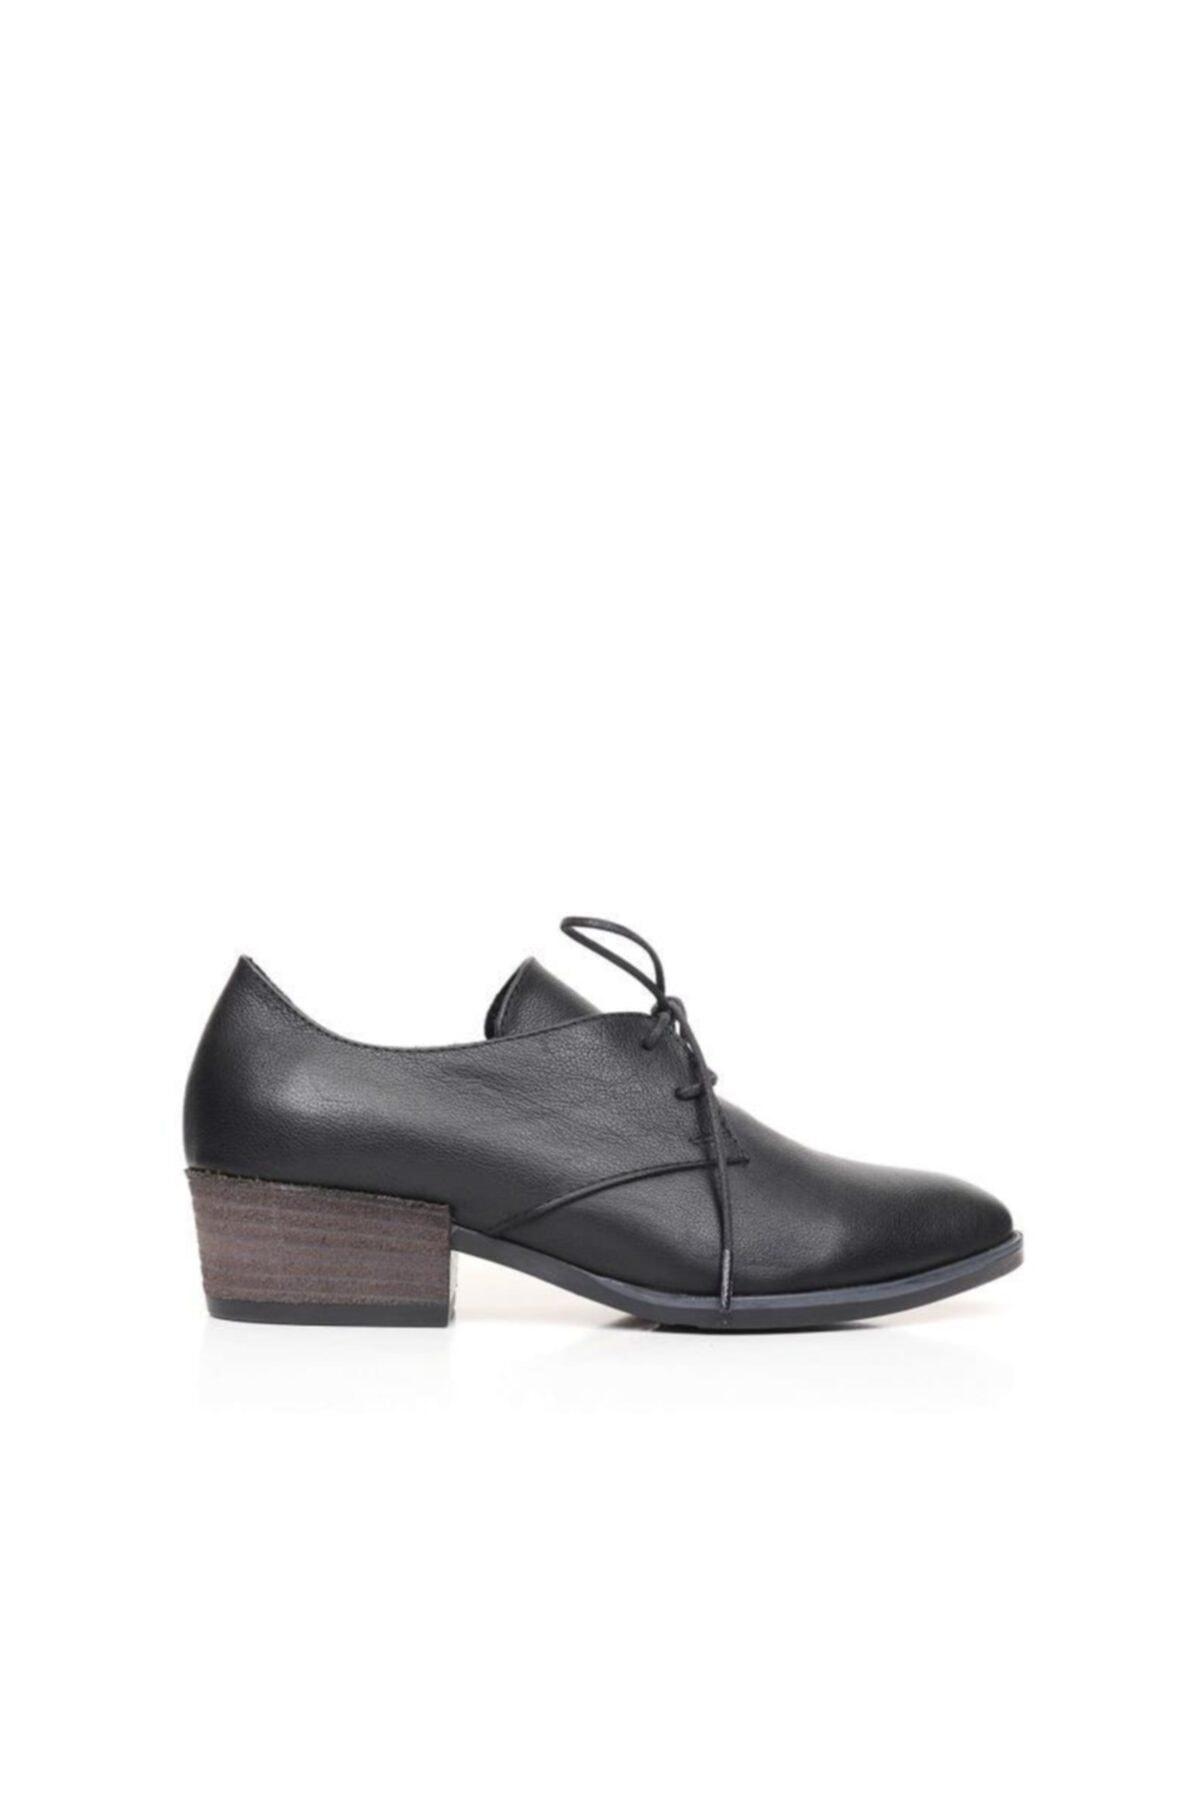 BUENO Shoes  Kadın Bot 9p1304 1